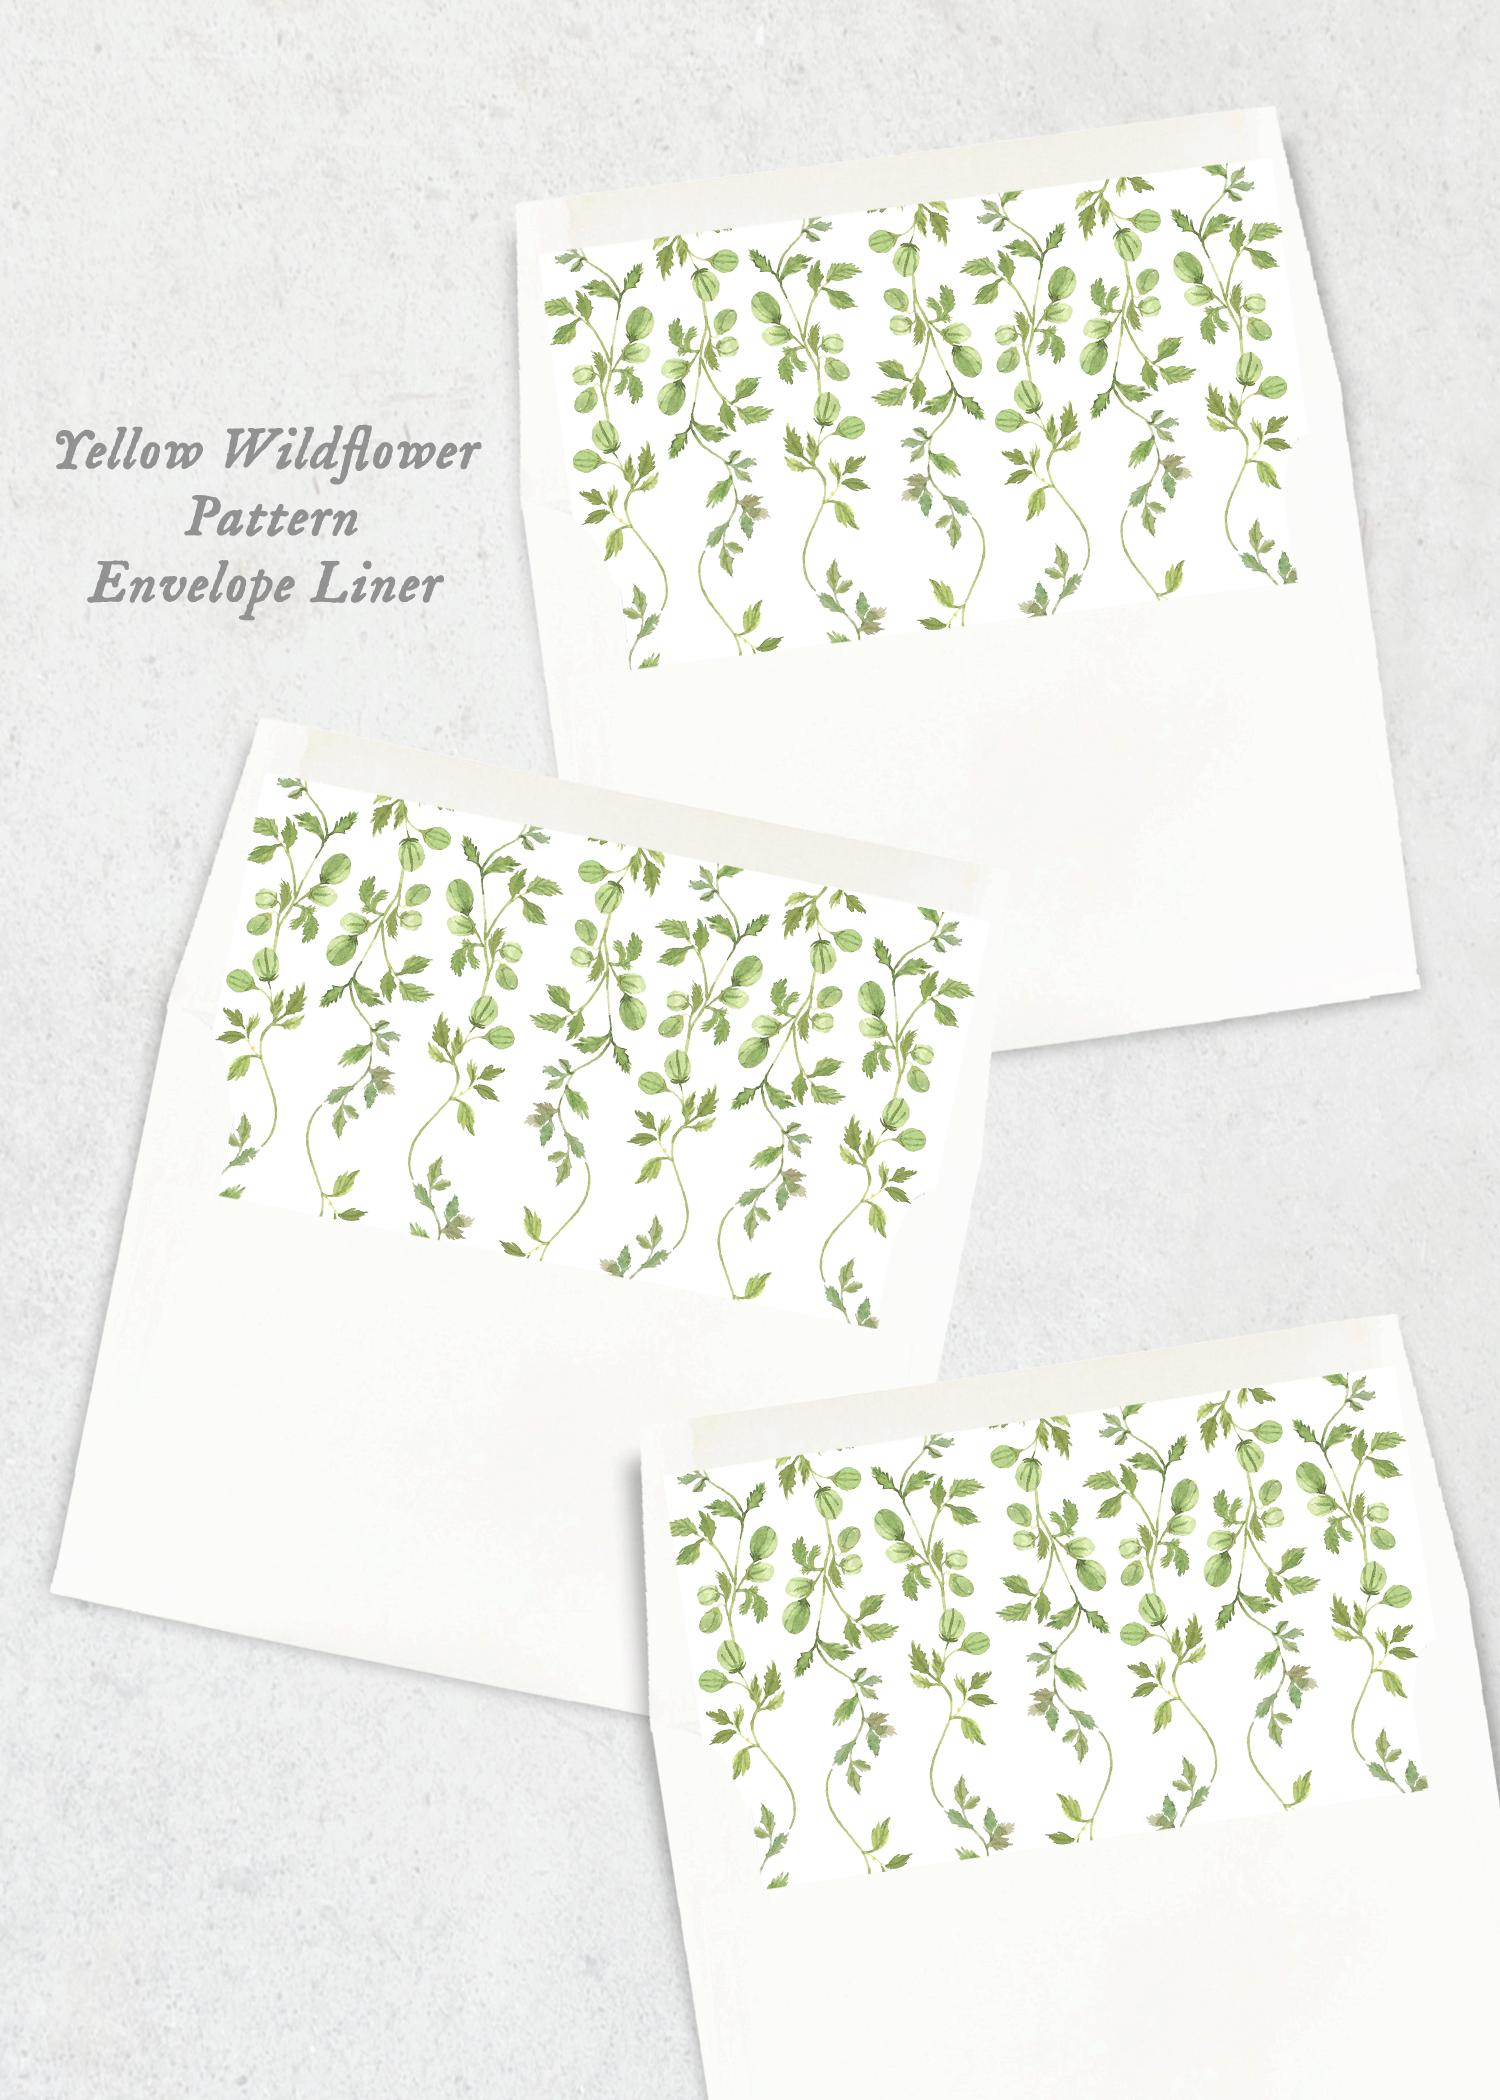 envelope liner yellow wildflower